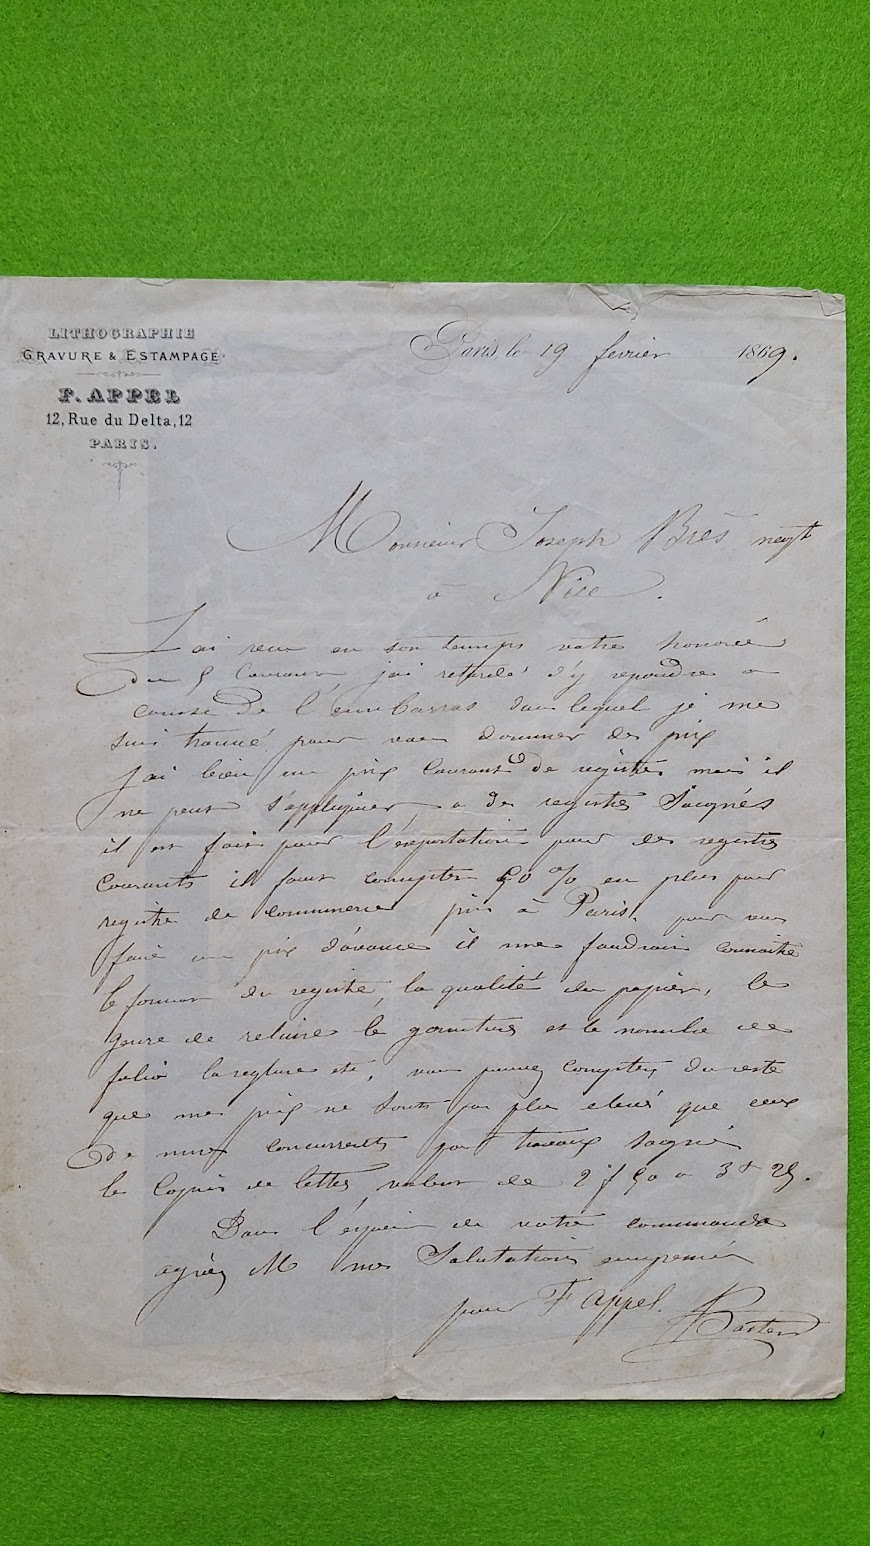 Brief an Jaques / Joseph Brès von der Lithographischen Druckerei François Appel - Rue du Delta, 12 - Paris, 19. Februar 1869